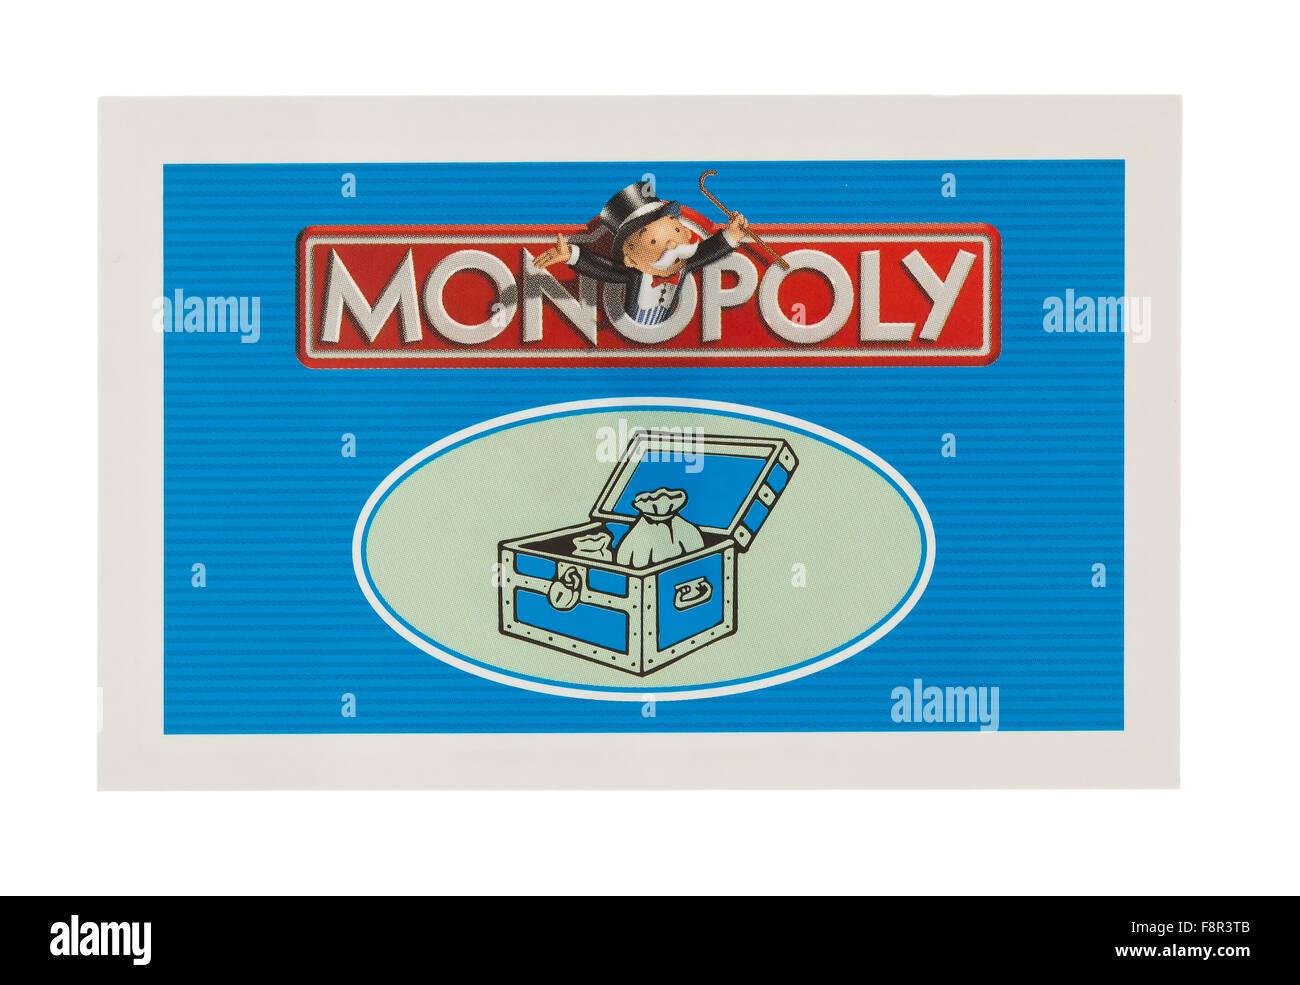 Monopoly Ereigniskarte